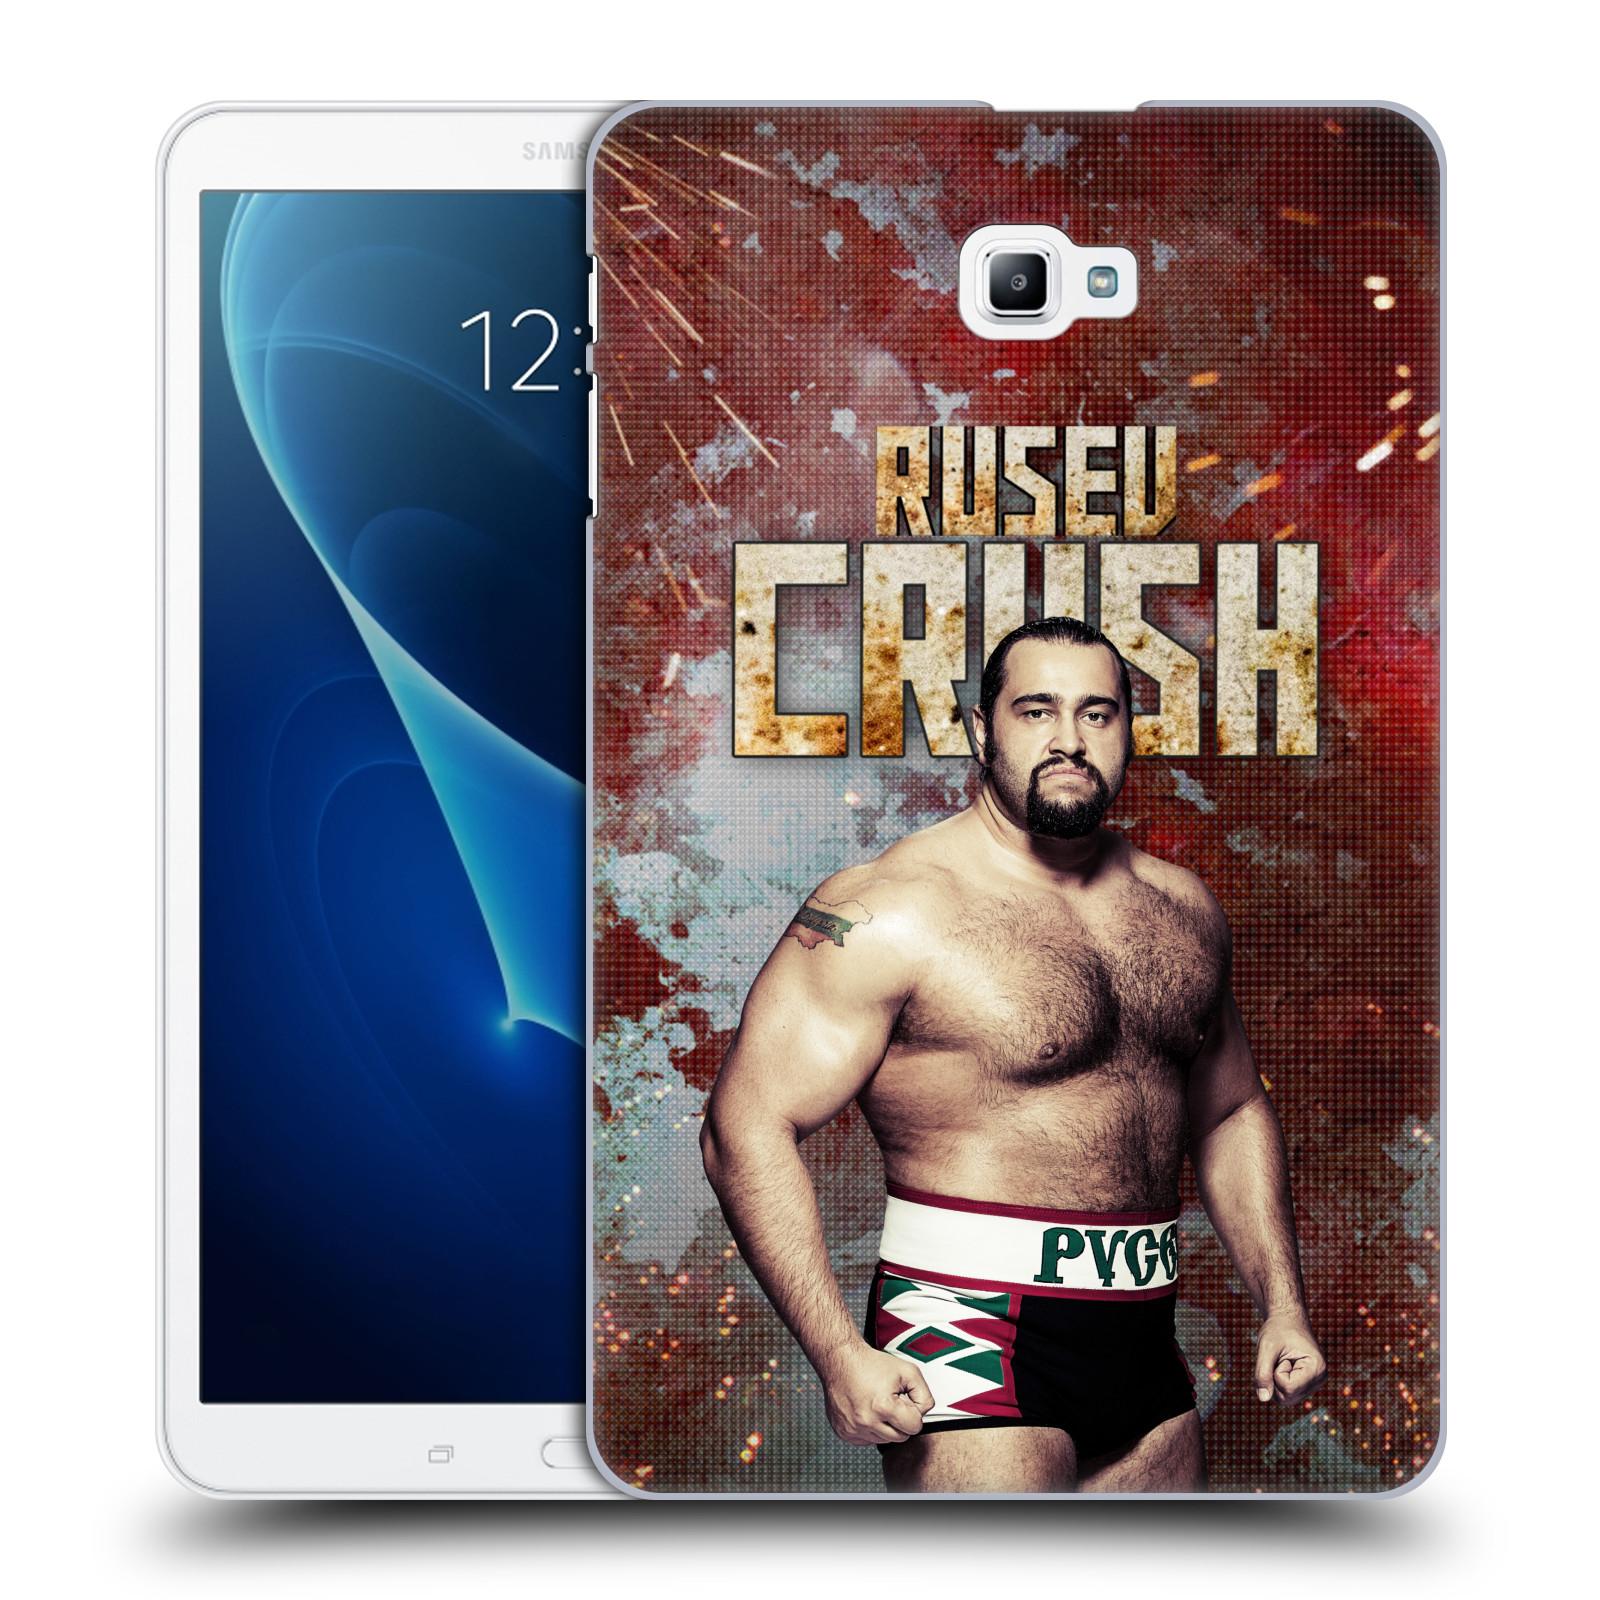 OFFICIAL-WWE-RUSEV-CRUSH-HARD-BACK-CASE-FOR-SAMSUNG-TABLETS-1